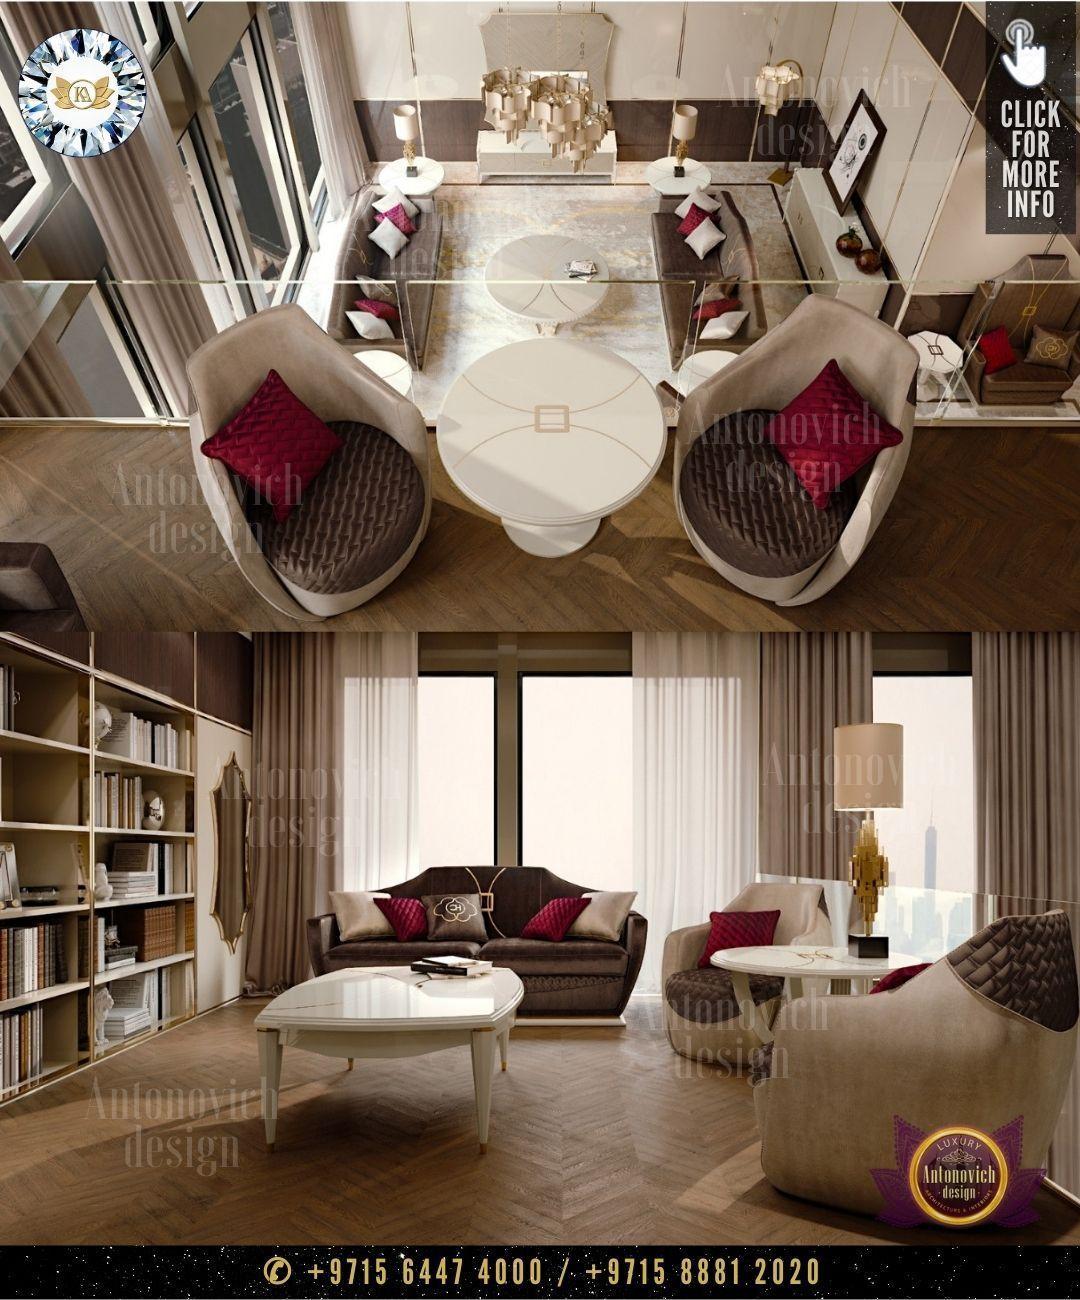 New Trendy Living Room Design Luxurious Living Room Design تصميم غرفة جلوس فاخرة Luxury Living Room Luxury Furniture Living Room Designs